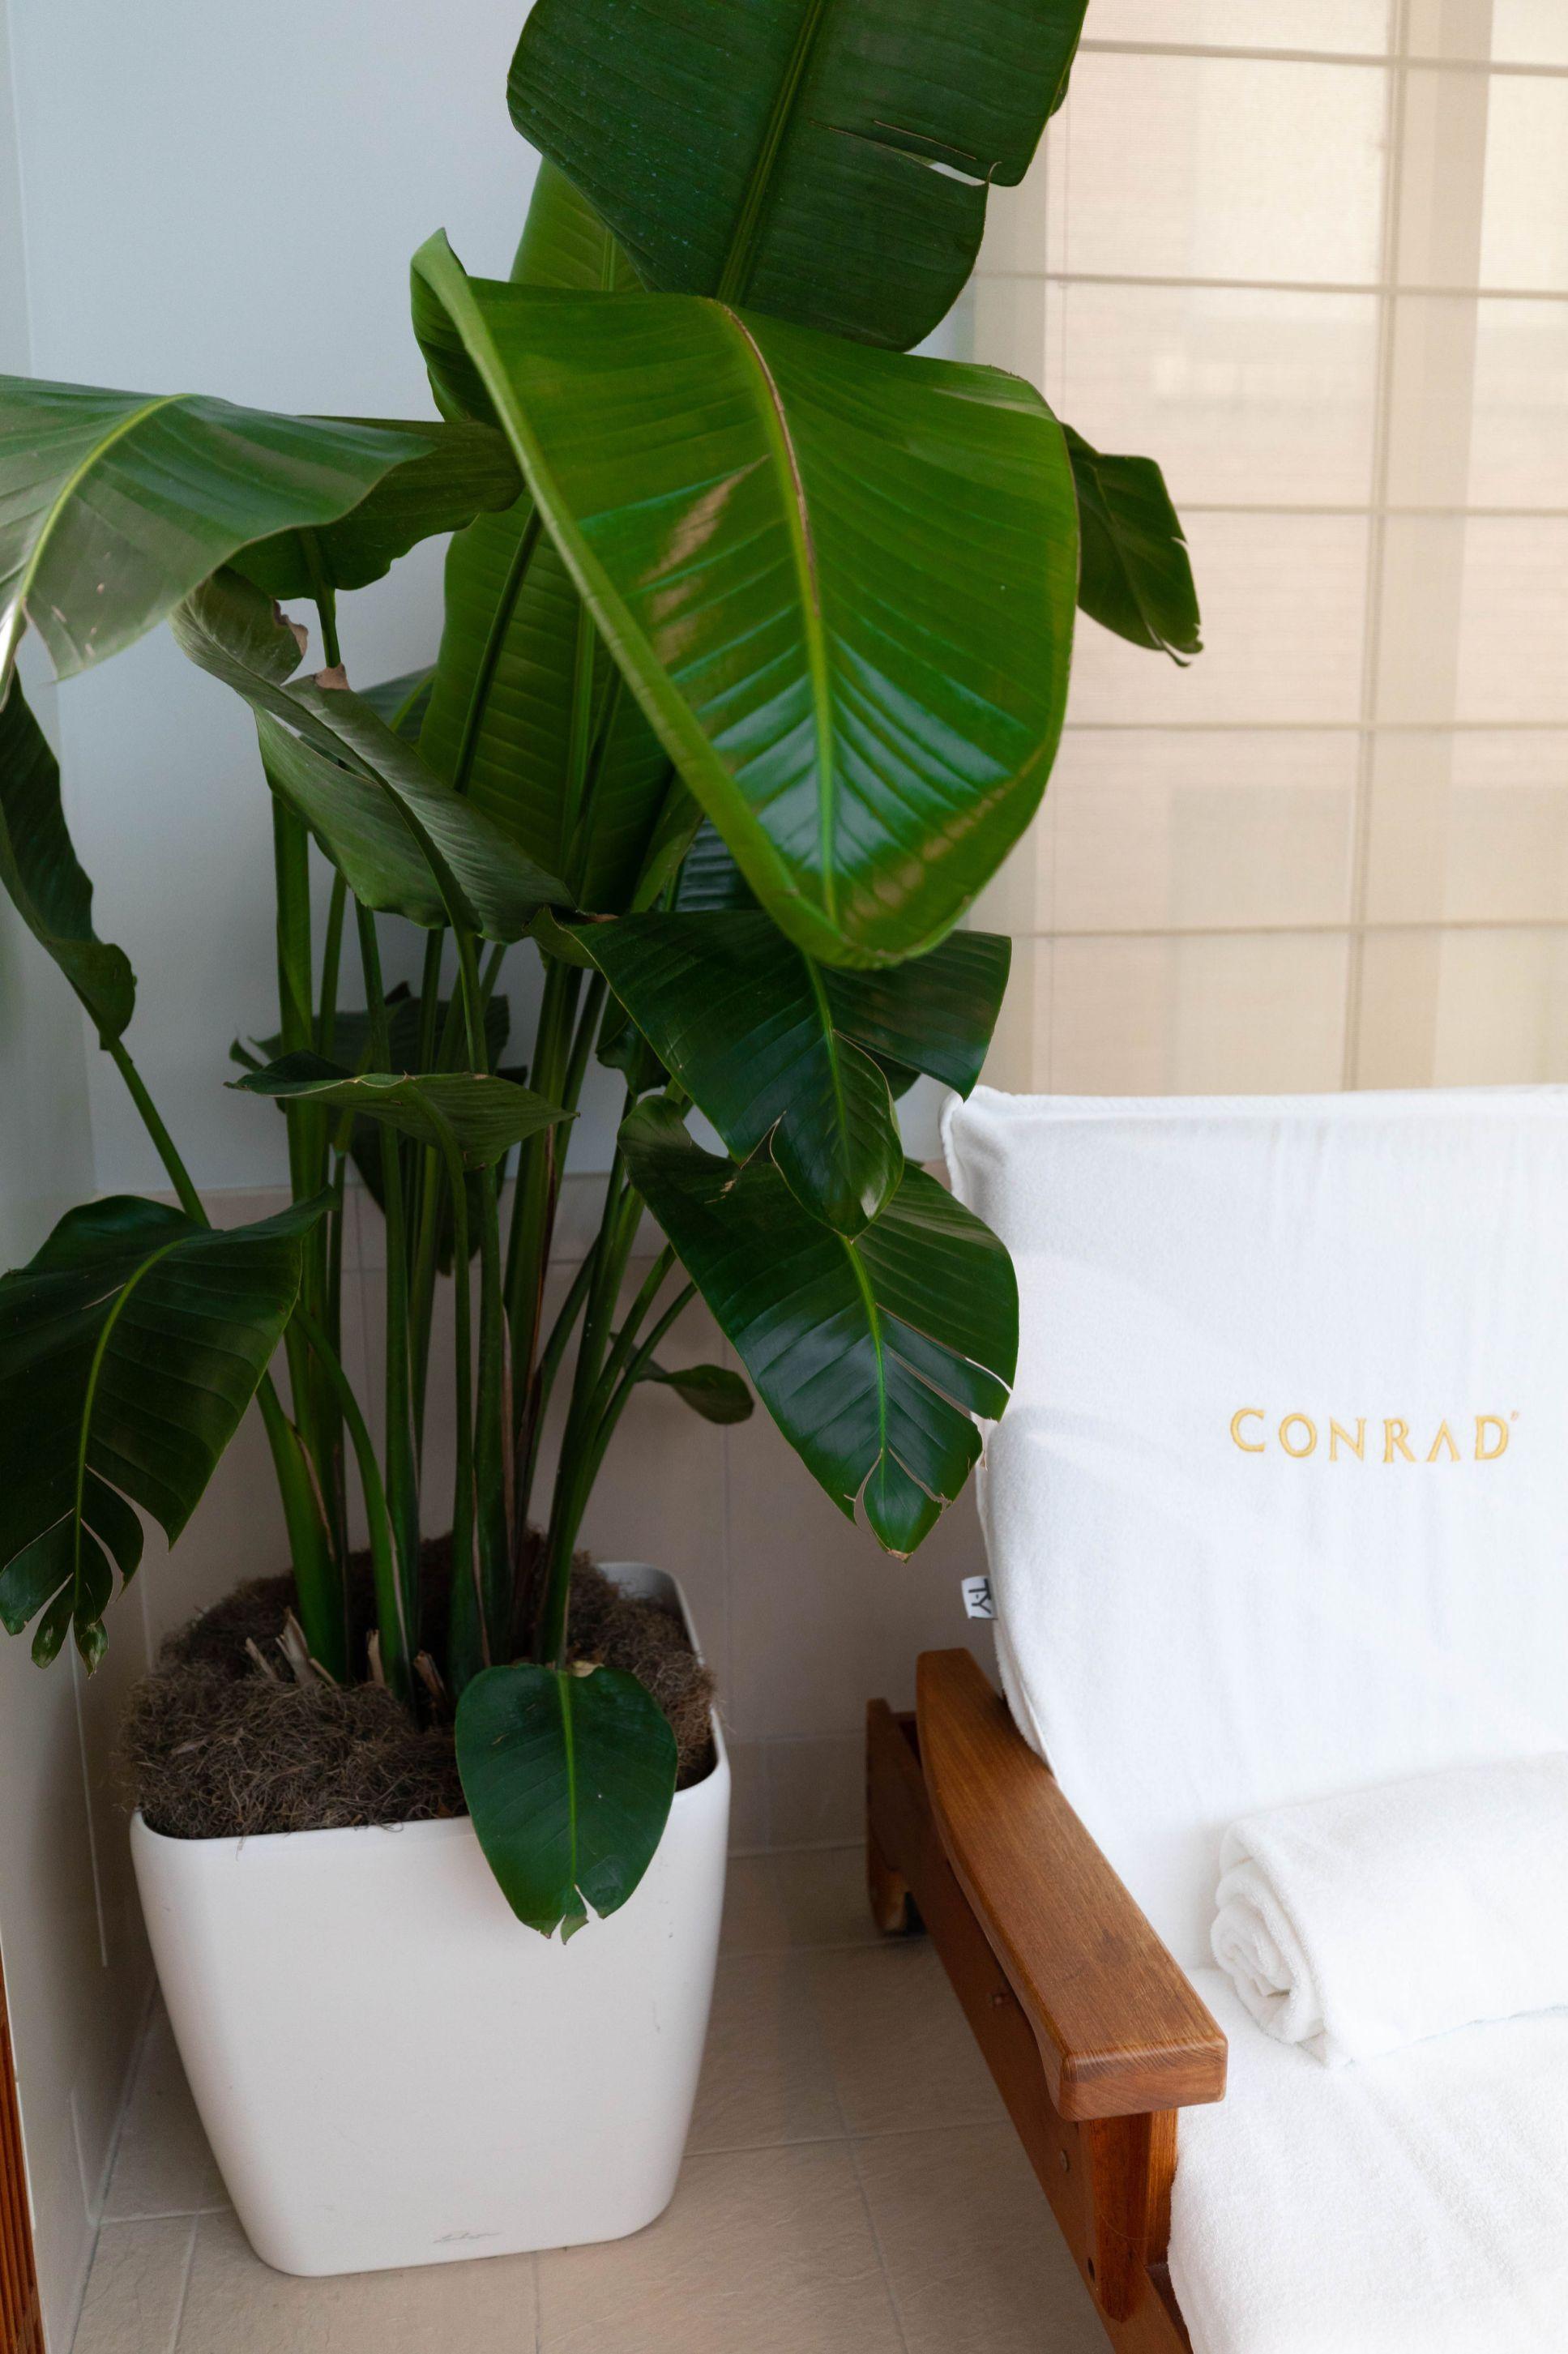 Luxury Hotels of the World: Conrad Indianapolis